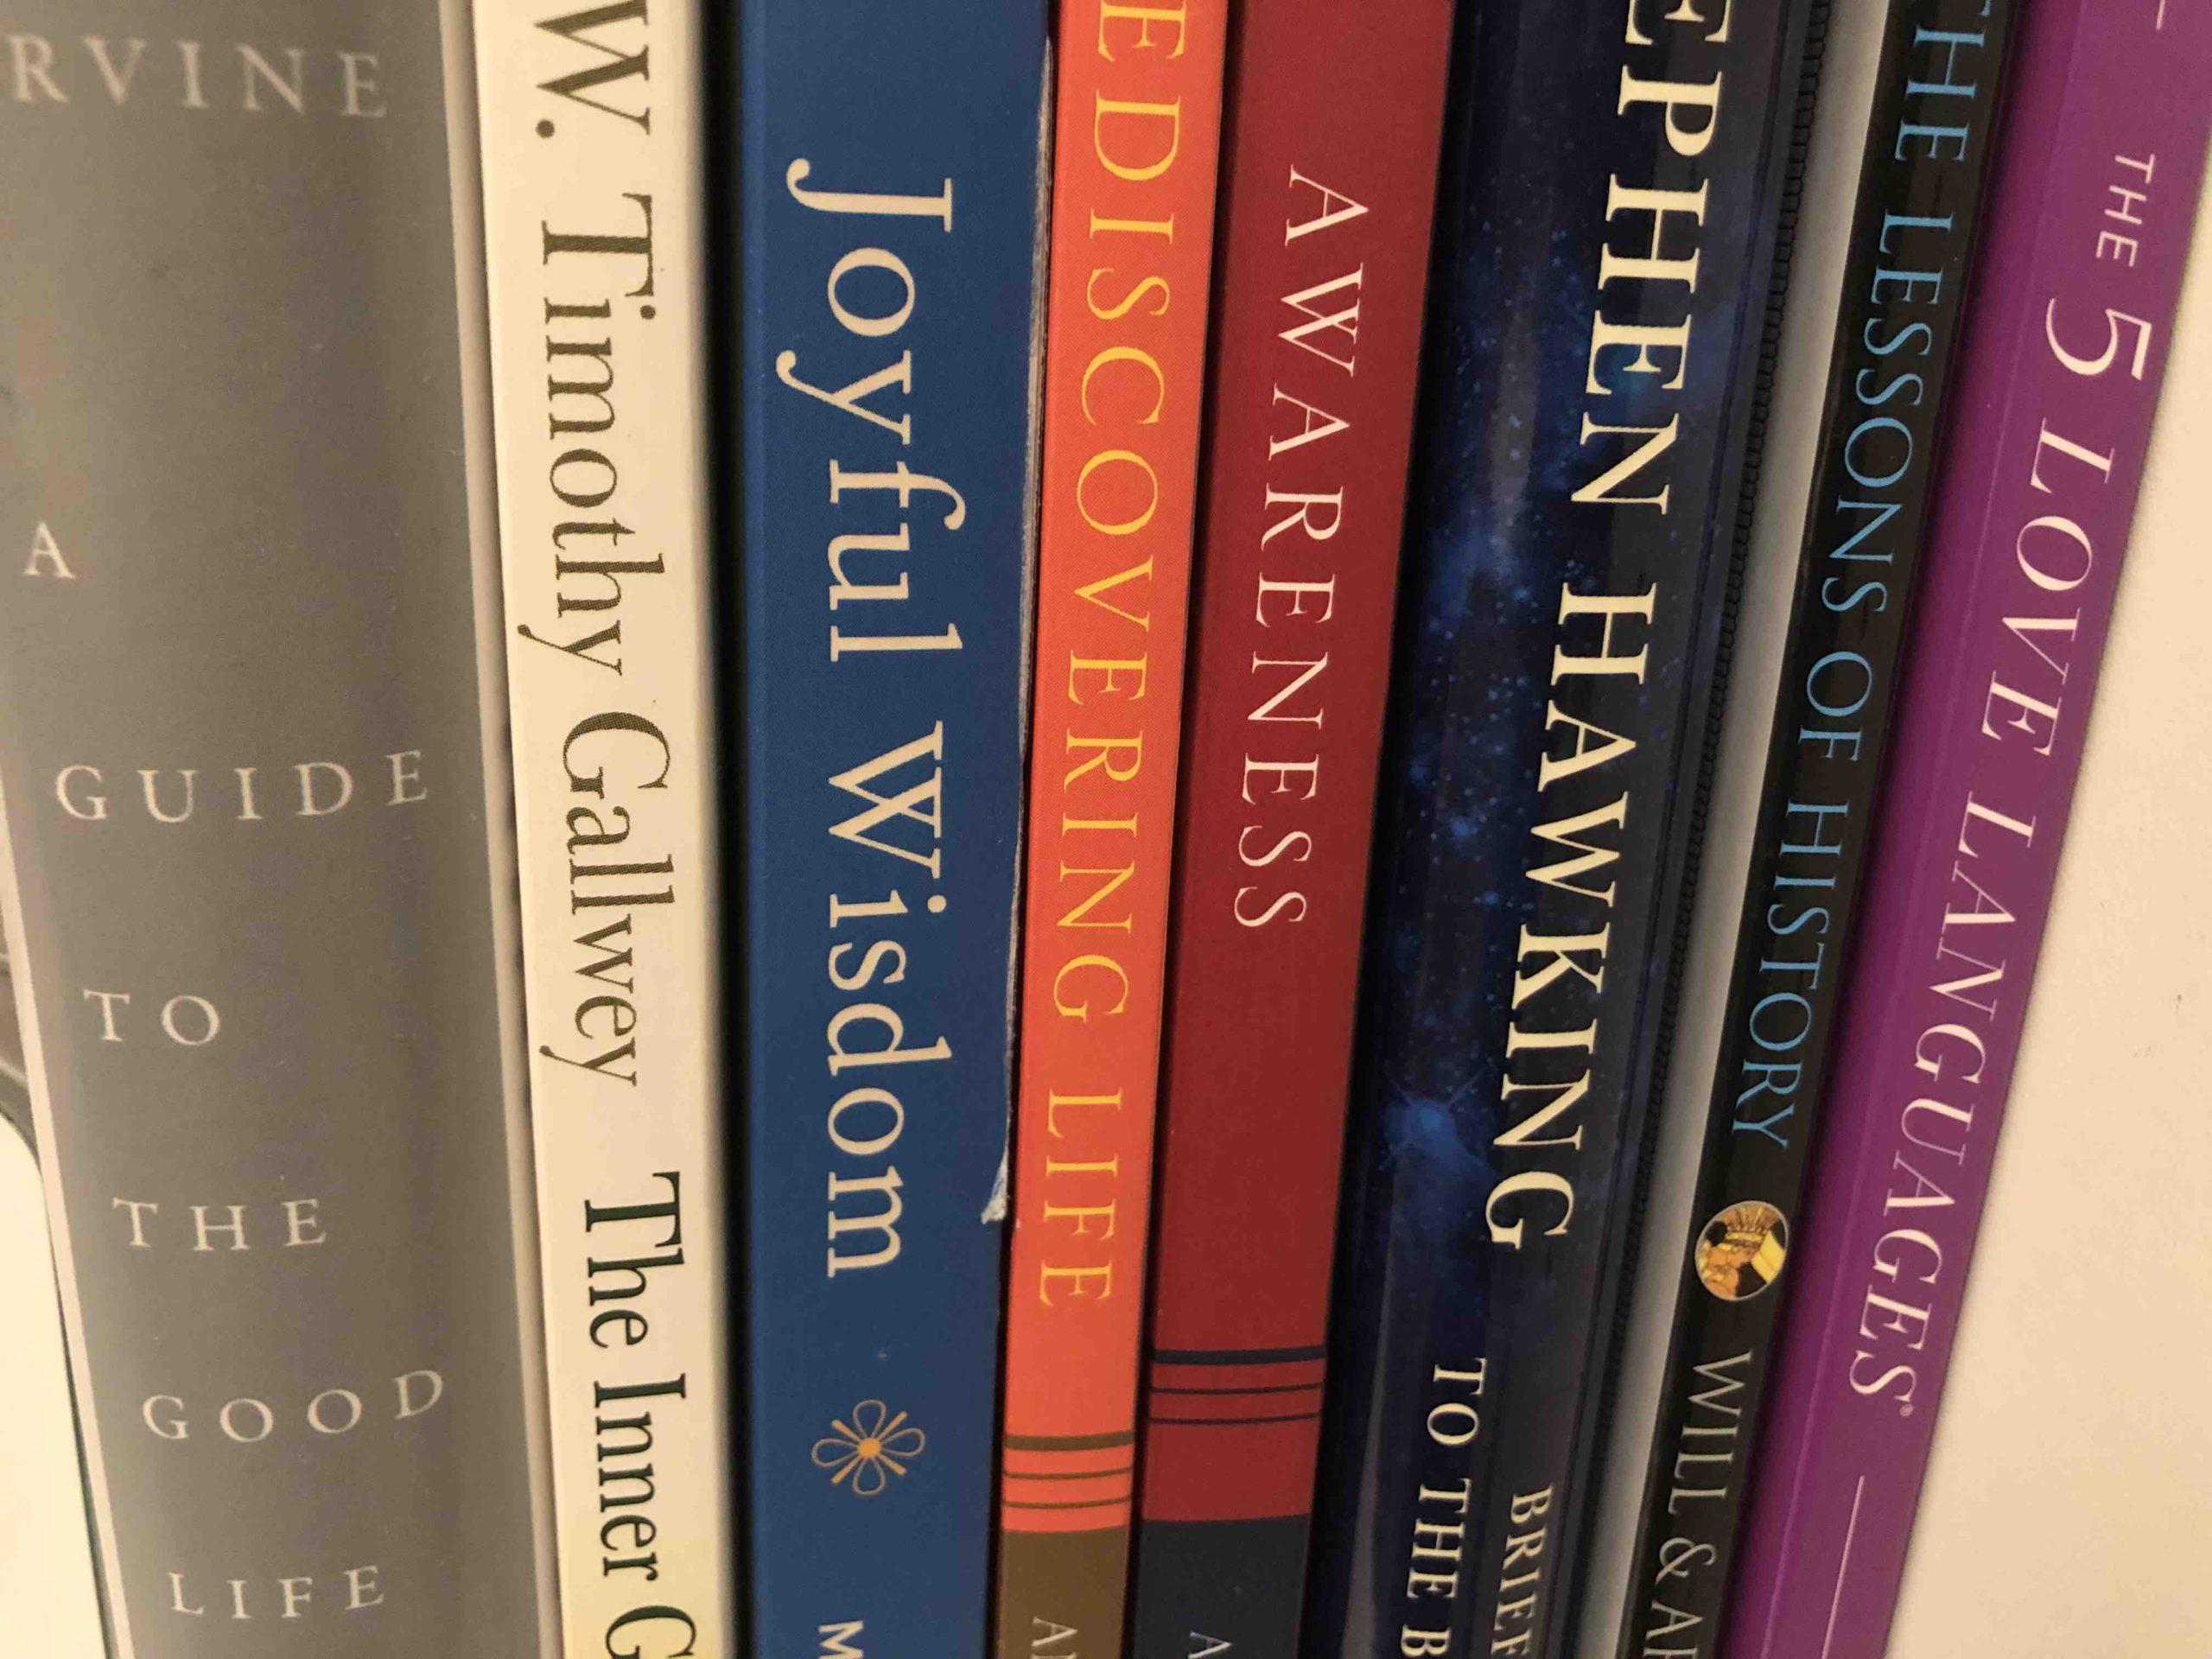 Books about enjoying life on a Bookshelf